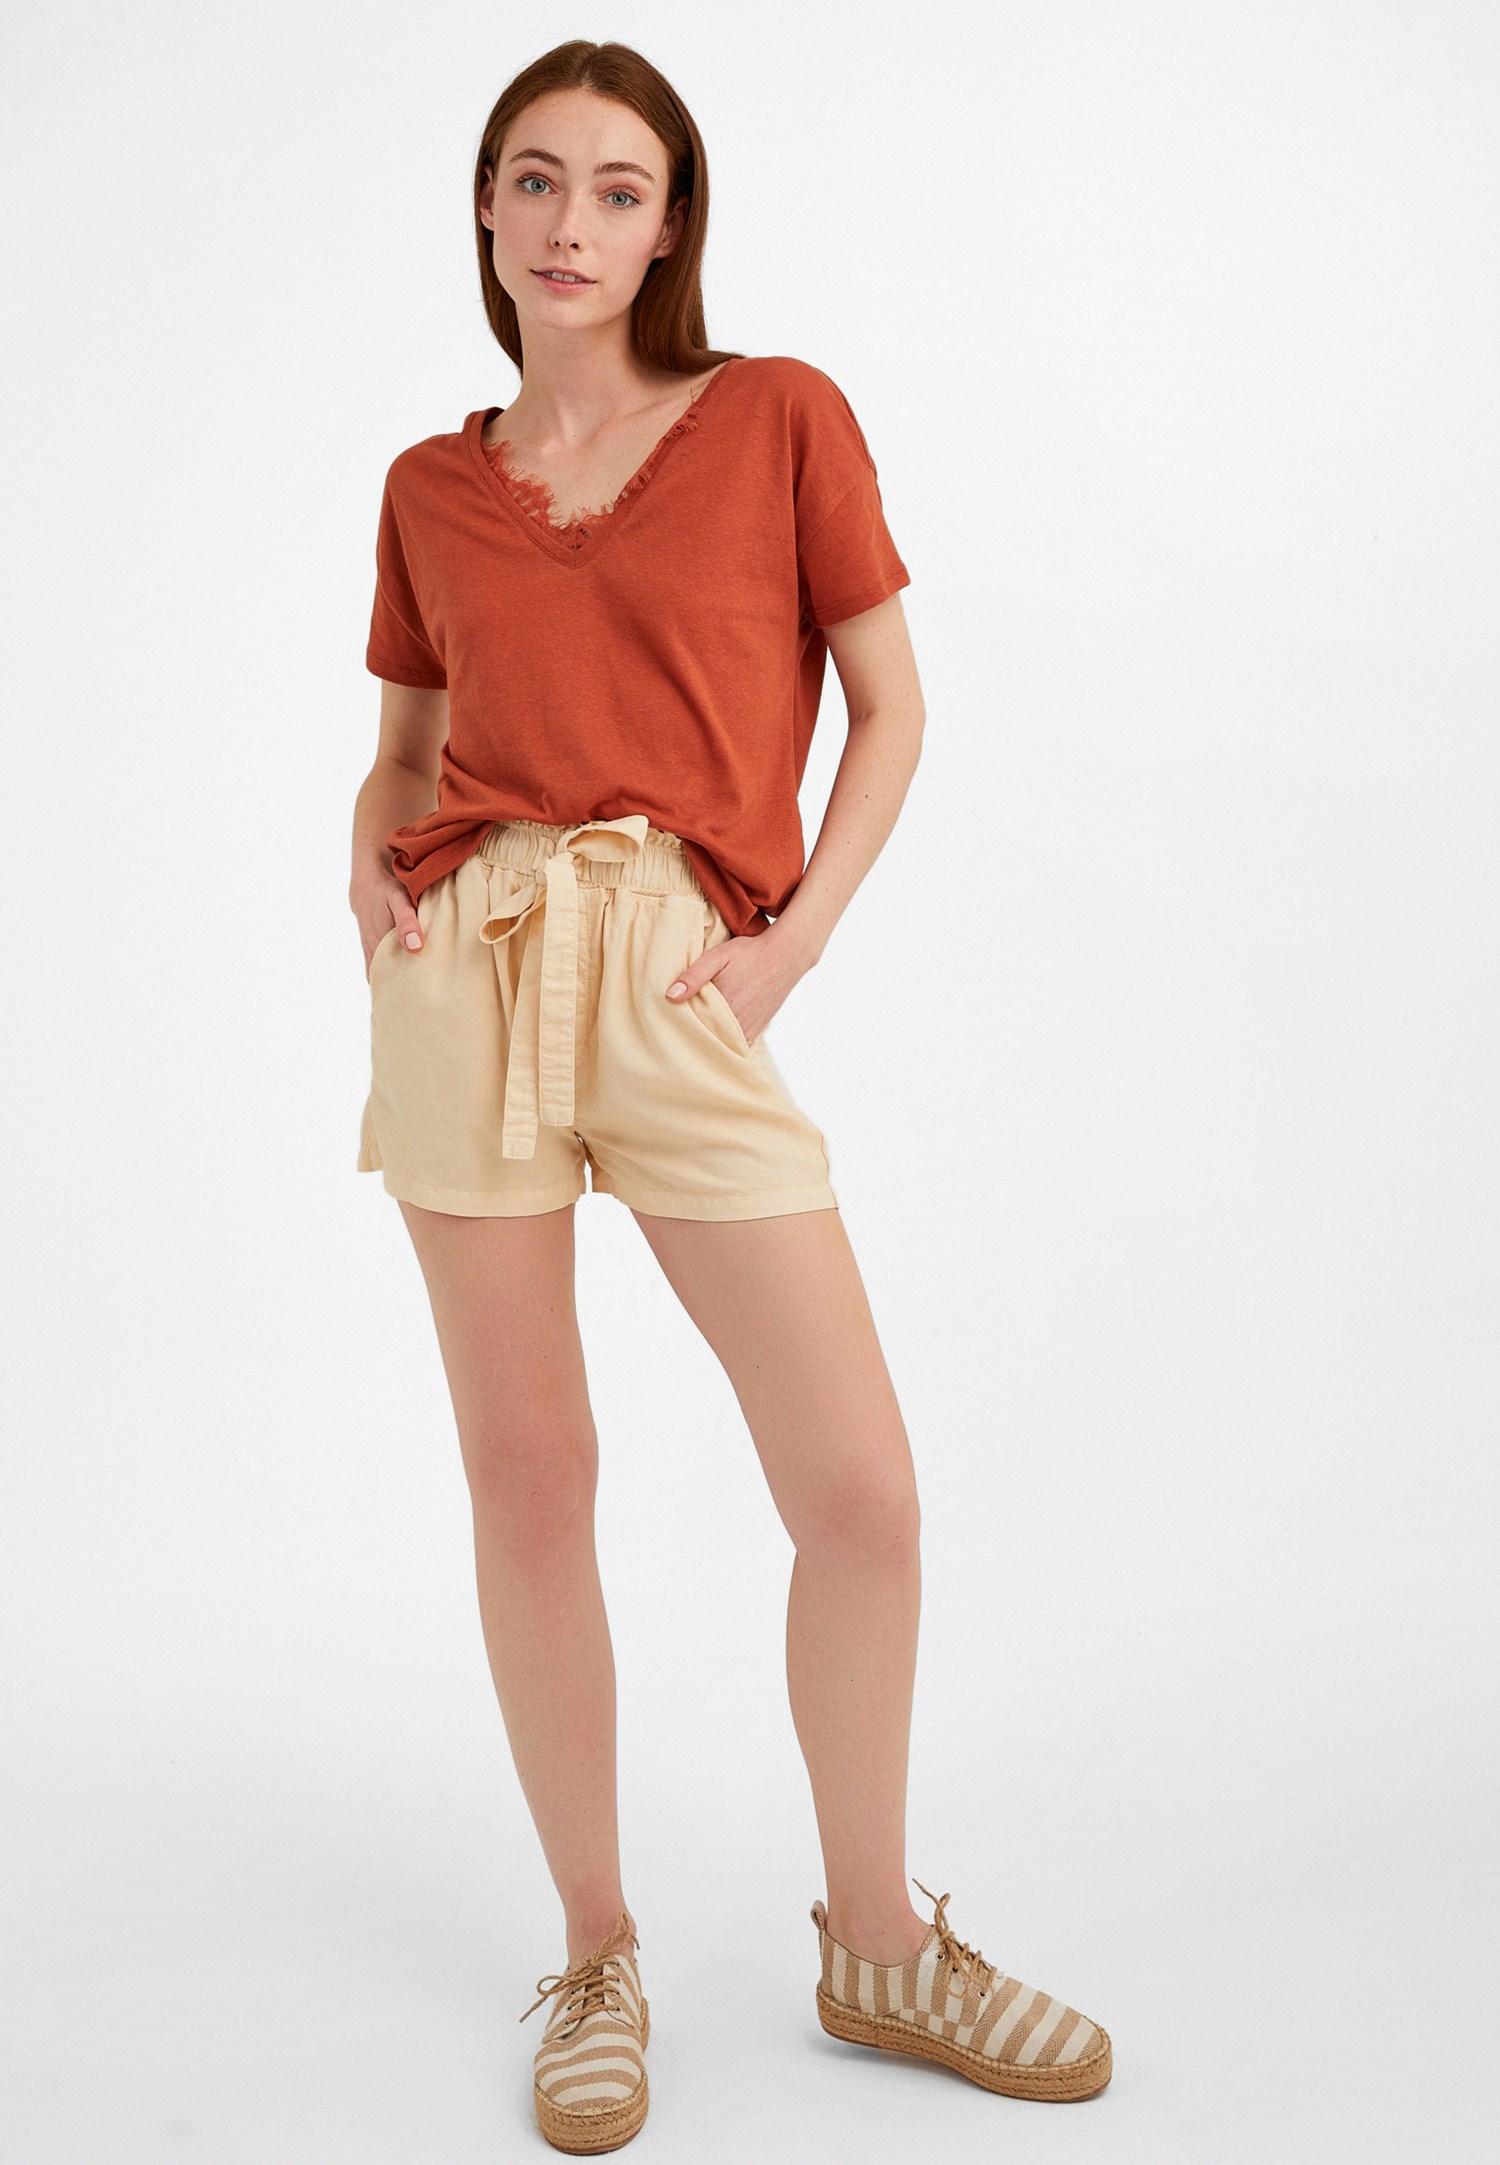 Bayan Kahverengi V Yaka Dantel Detaylı Tişört